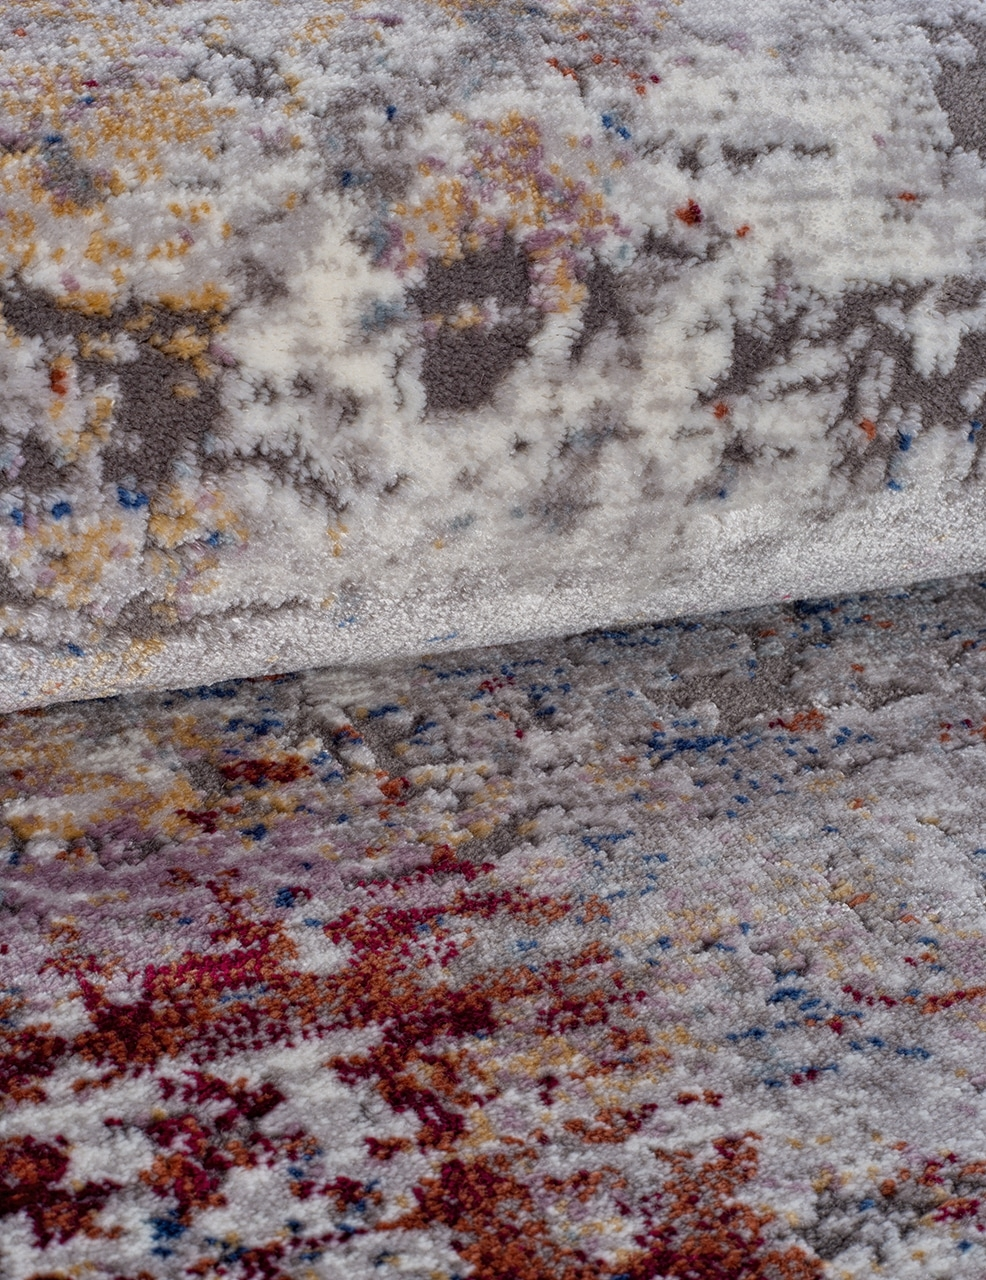 Ковер 05712G - GREY / GREY - Овал - коллекция RIM - фото 4